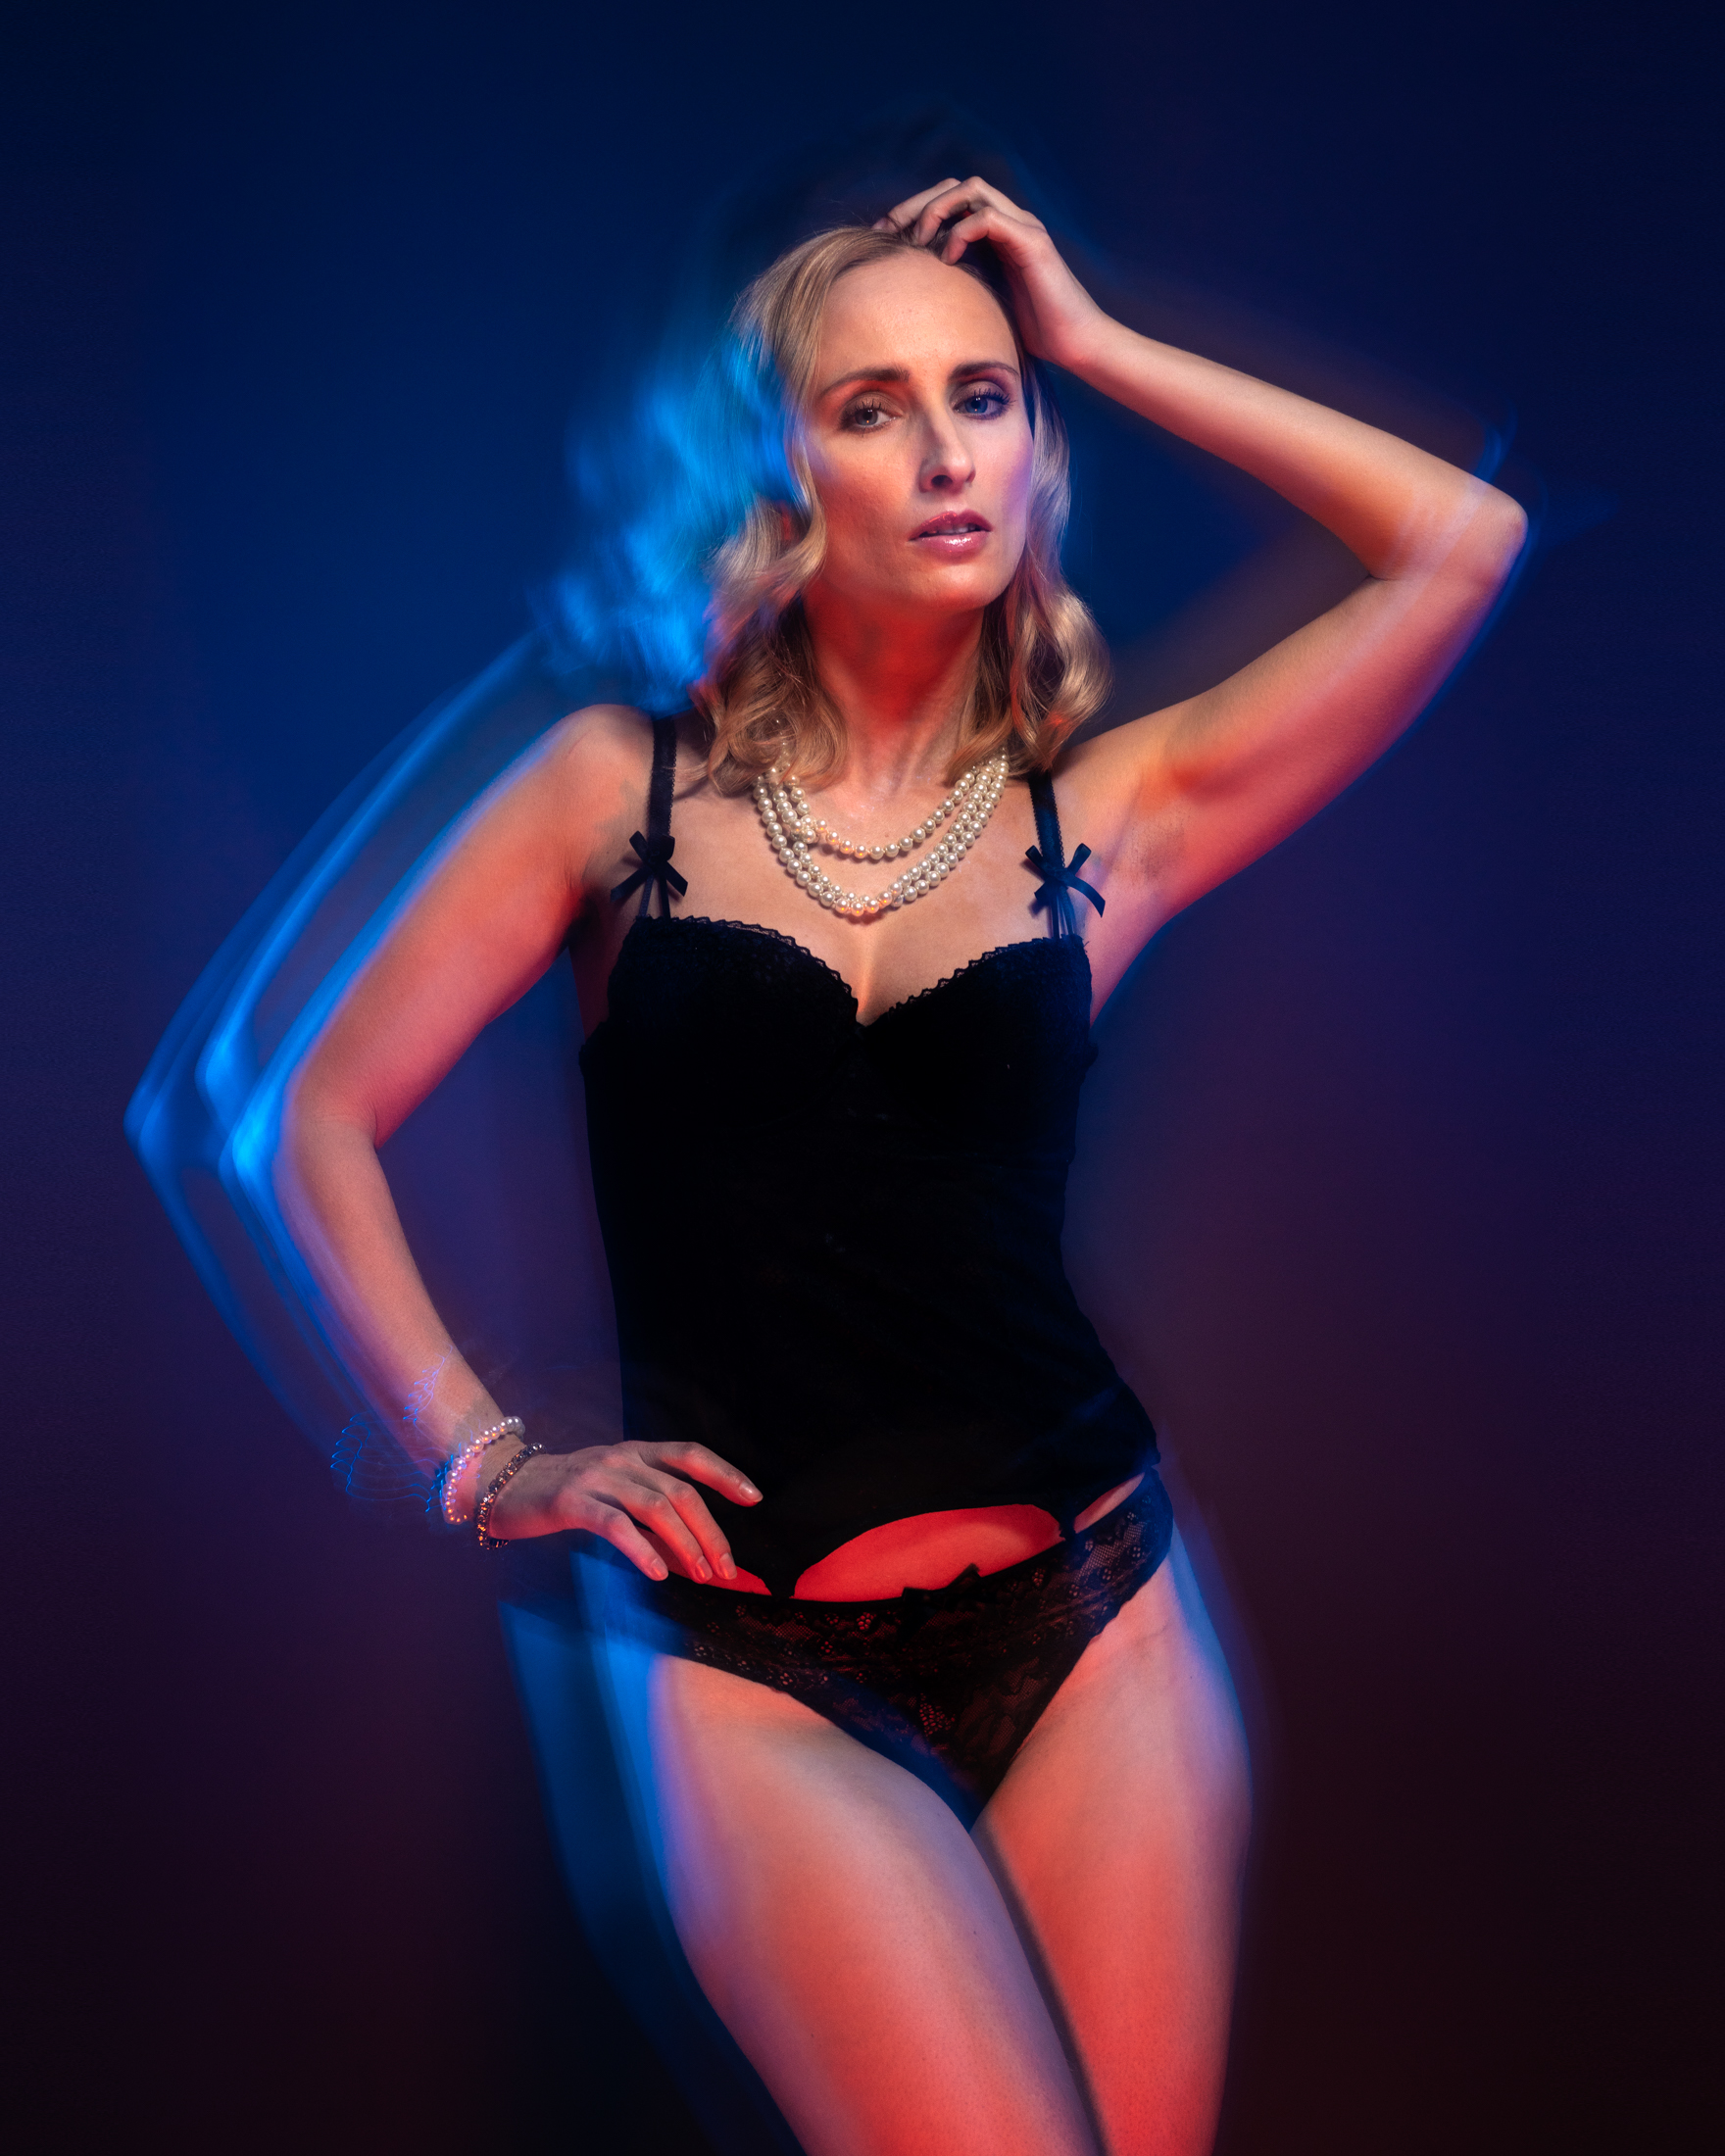 veronika sensual portrait with color gels in studio in frankfurt 01